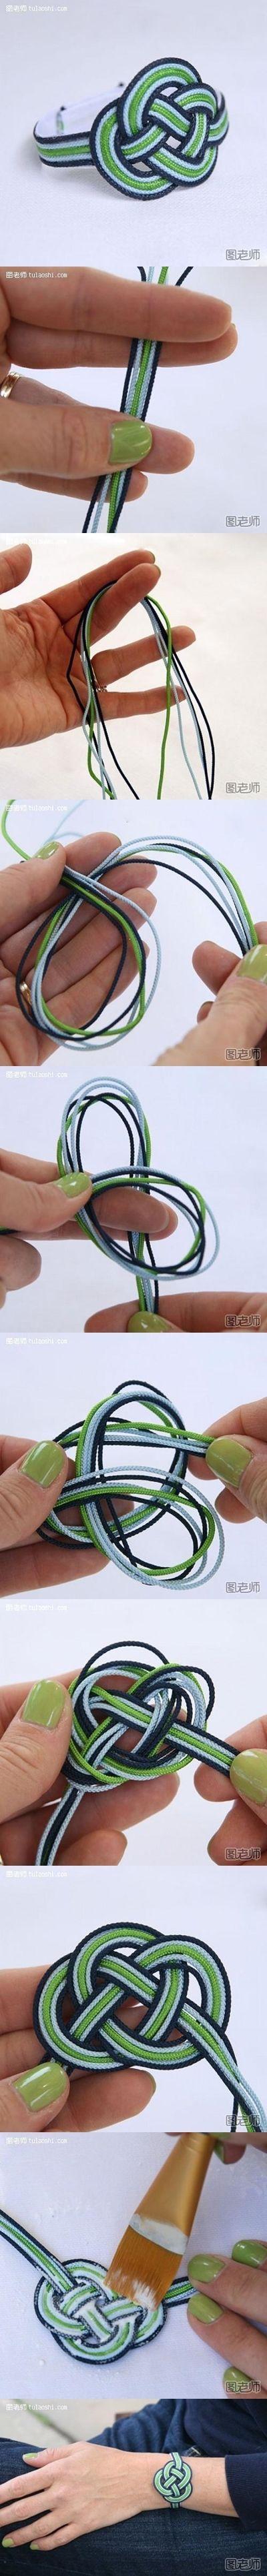 How to make love bracelet step by step DIY instructions How to make love bracelet step by step DIY instructions by diyforever